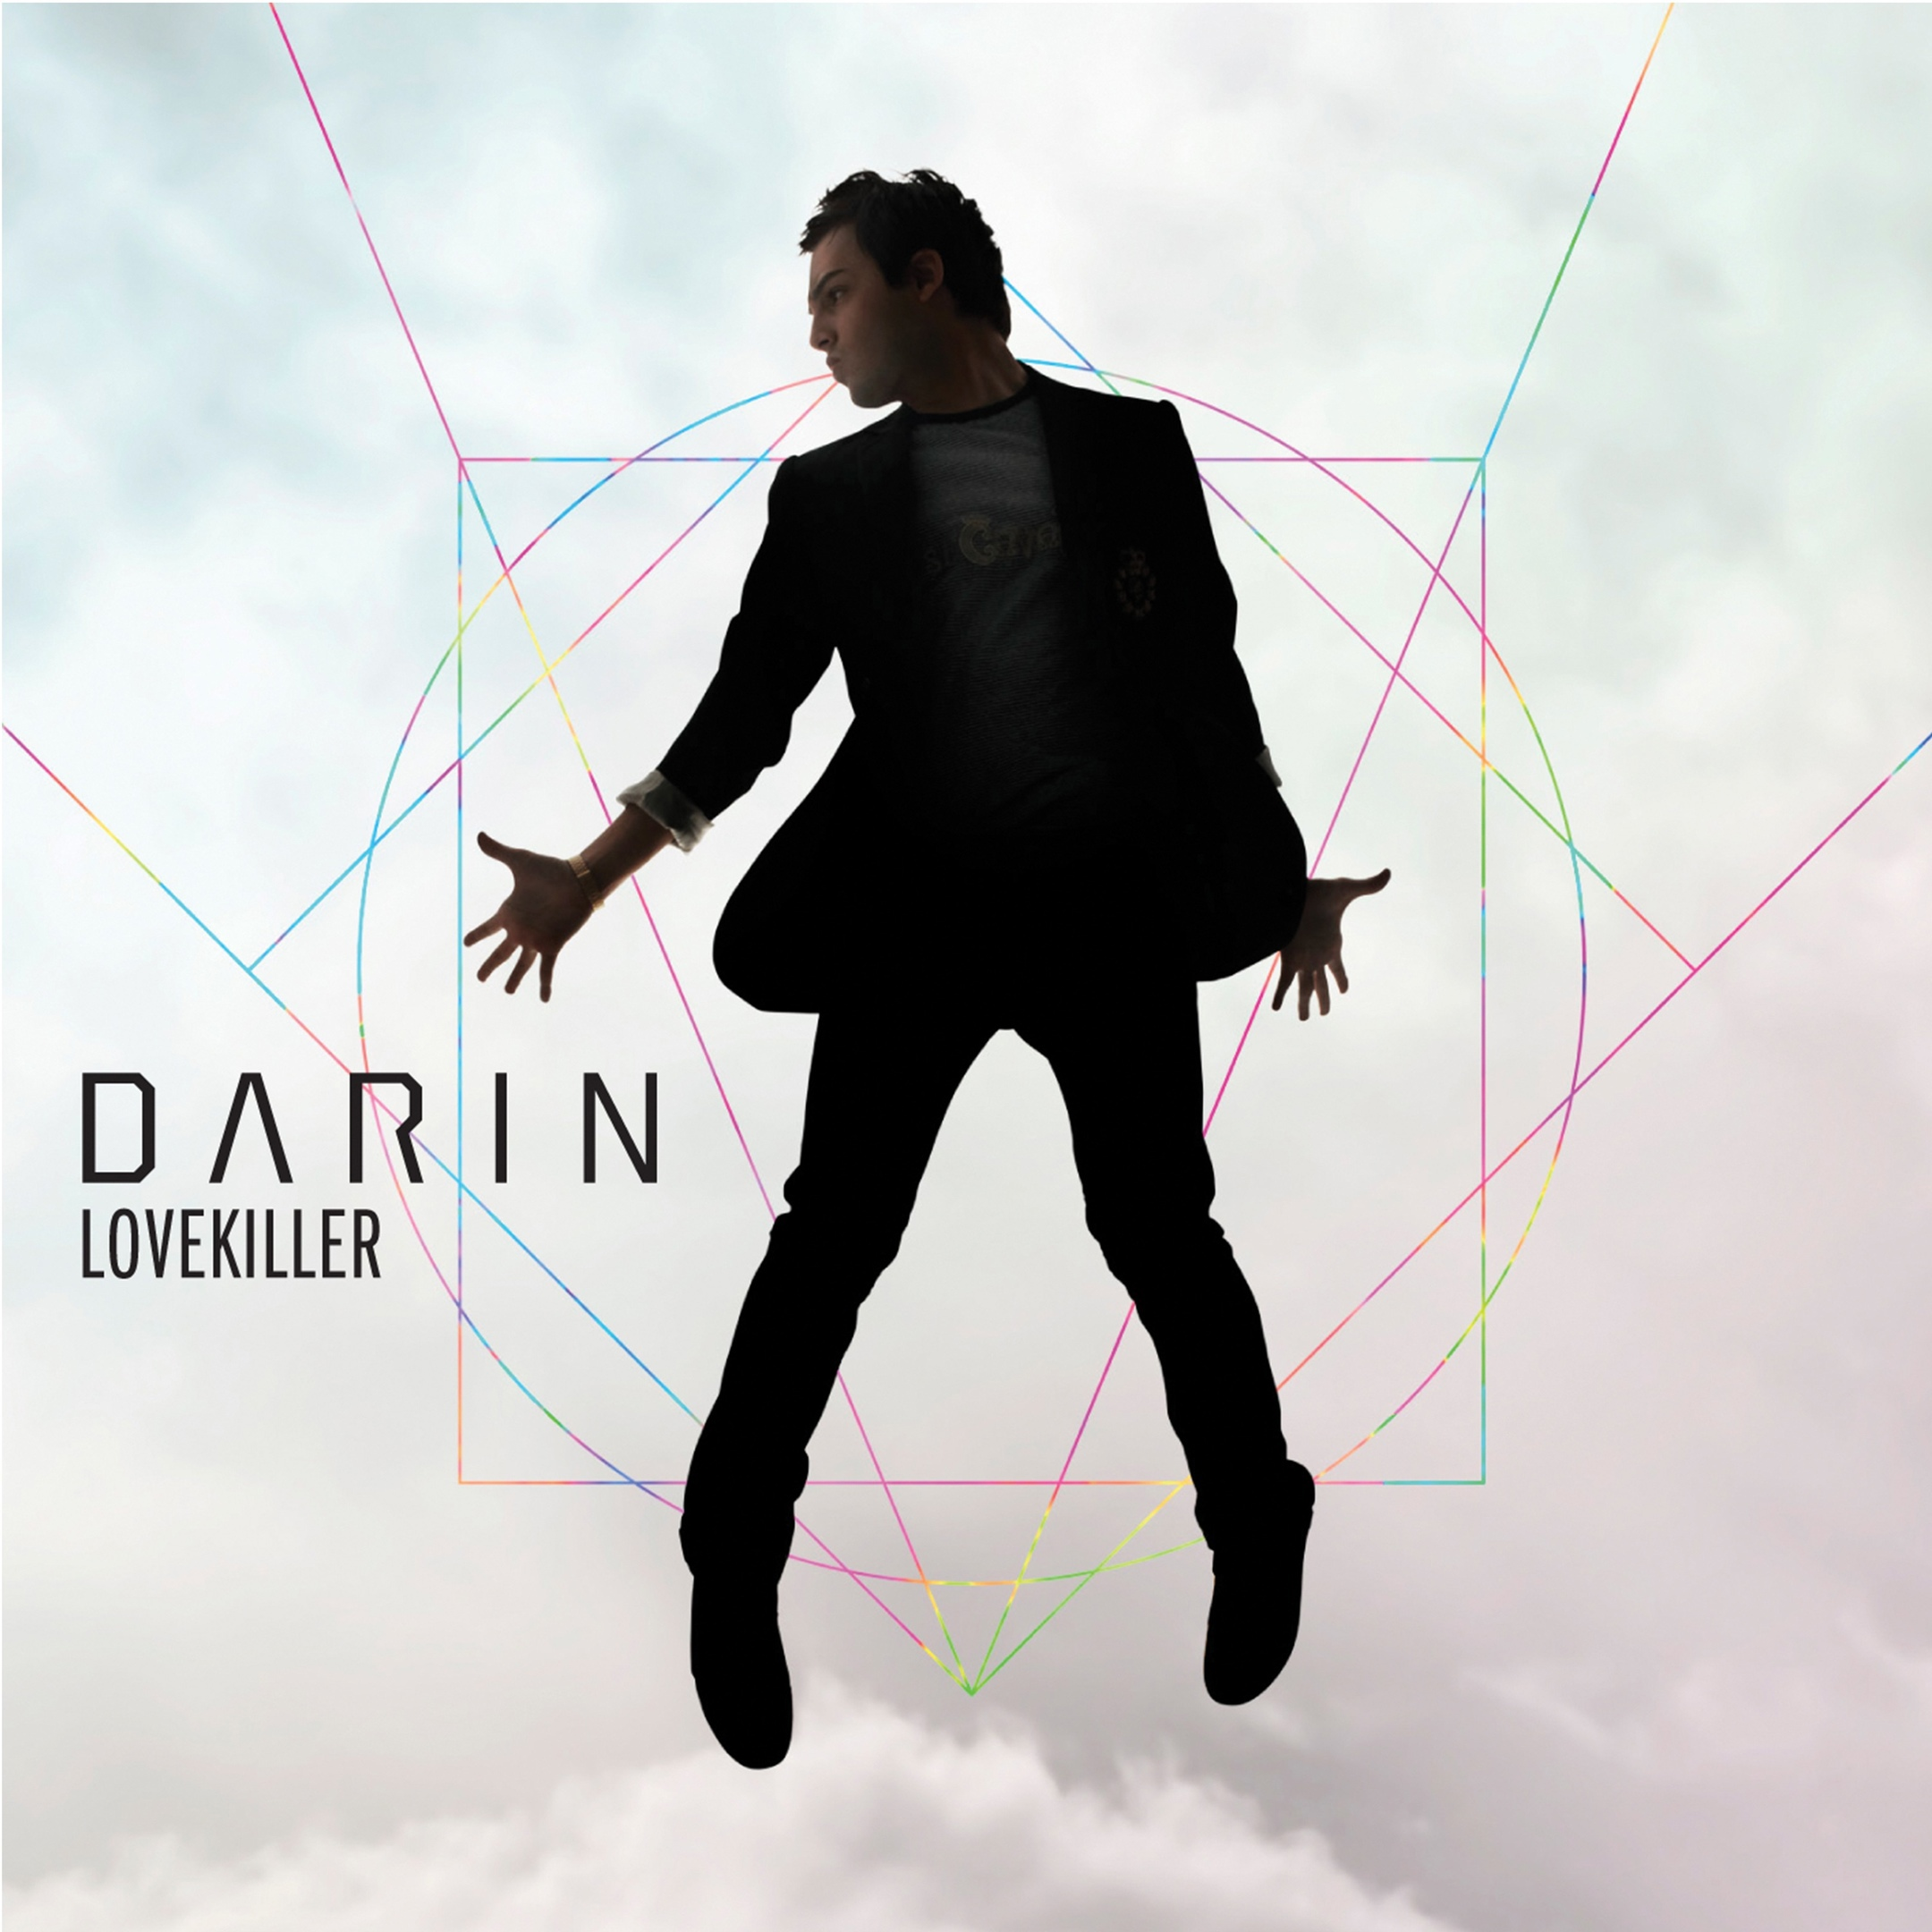 Darin album Lovekiller